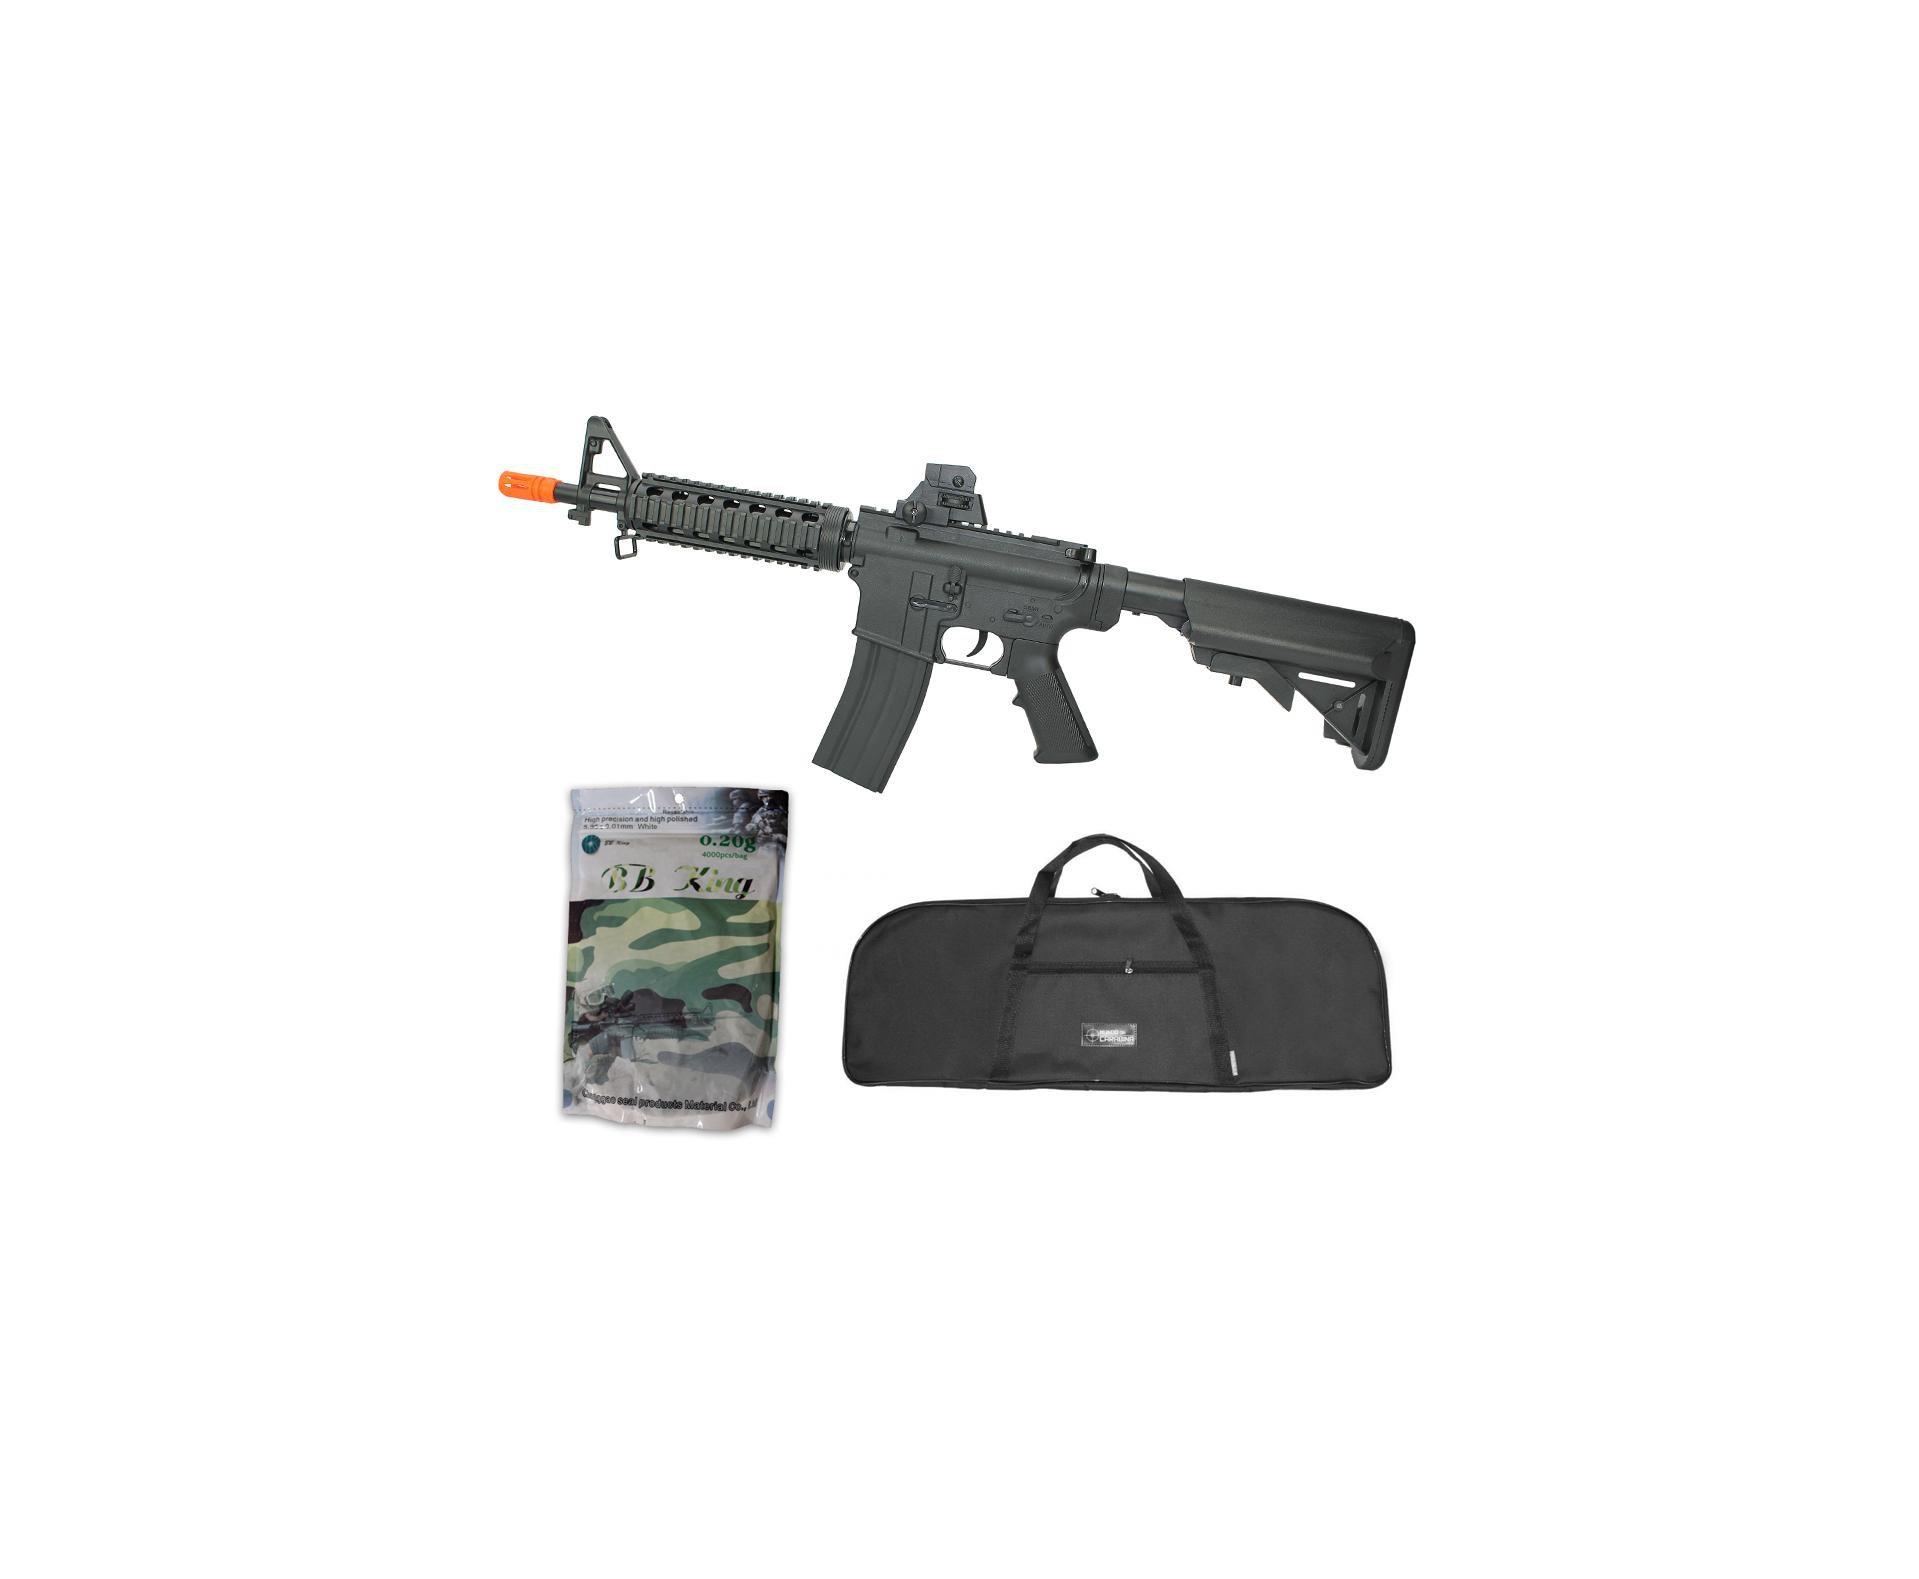 Rifle De Airsoft Vg M4ris-cqb 8907 Spring 6mm + Capa Simples + Esfera Plastica 0,20g 4000uni